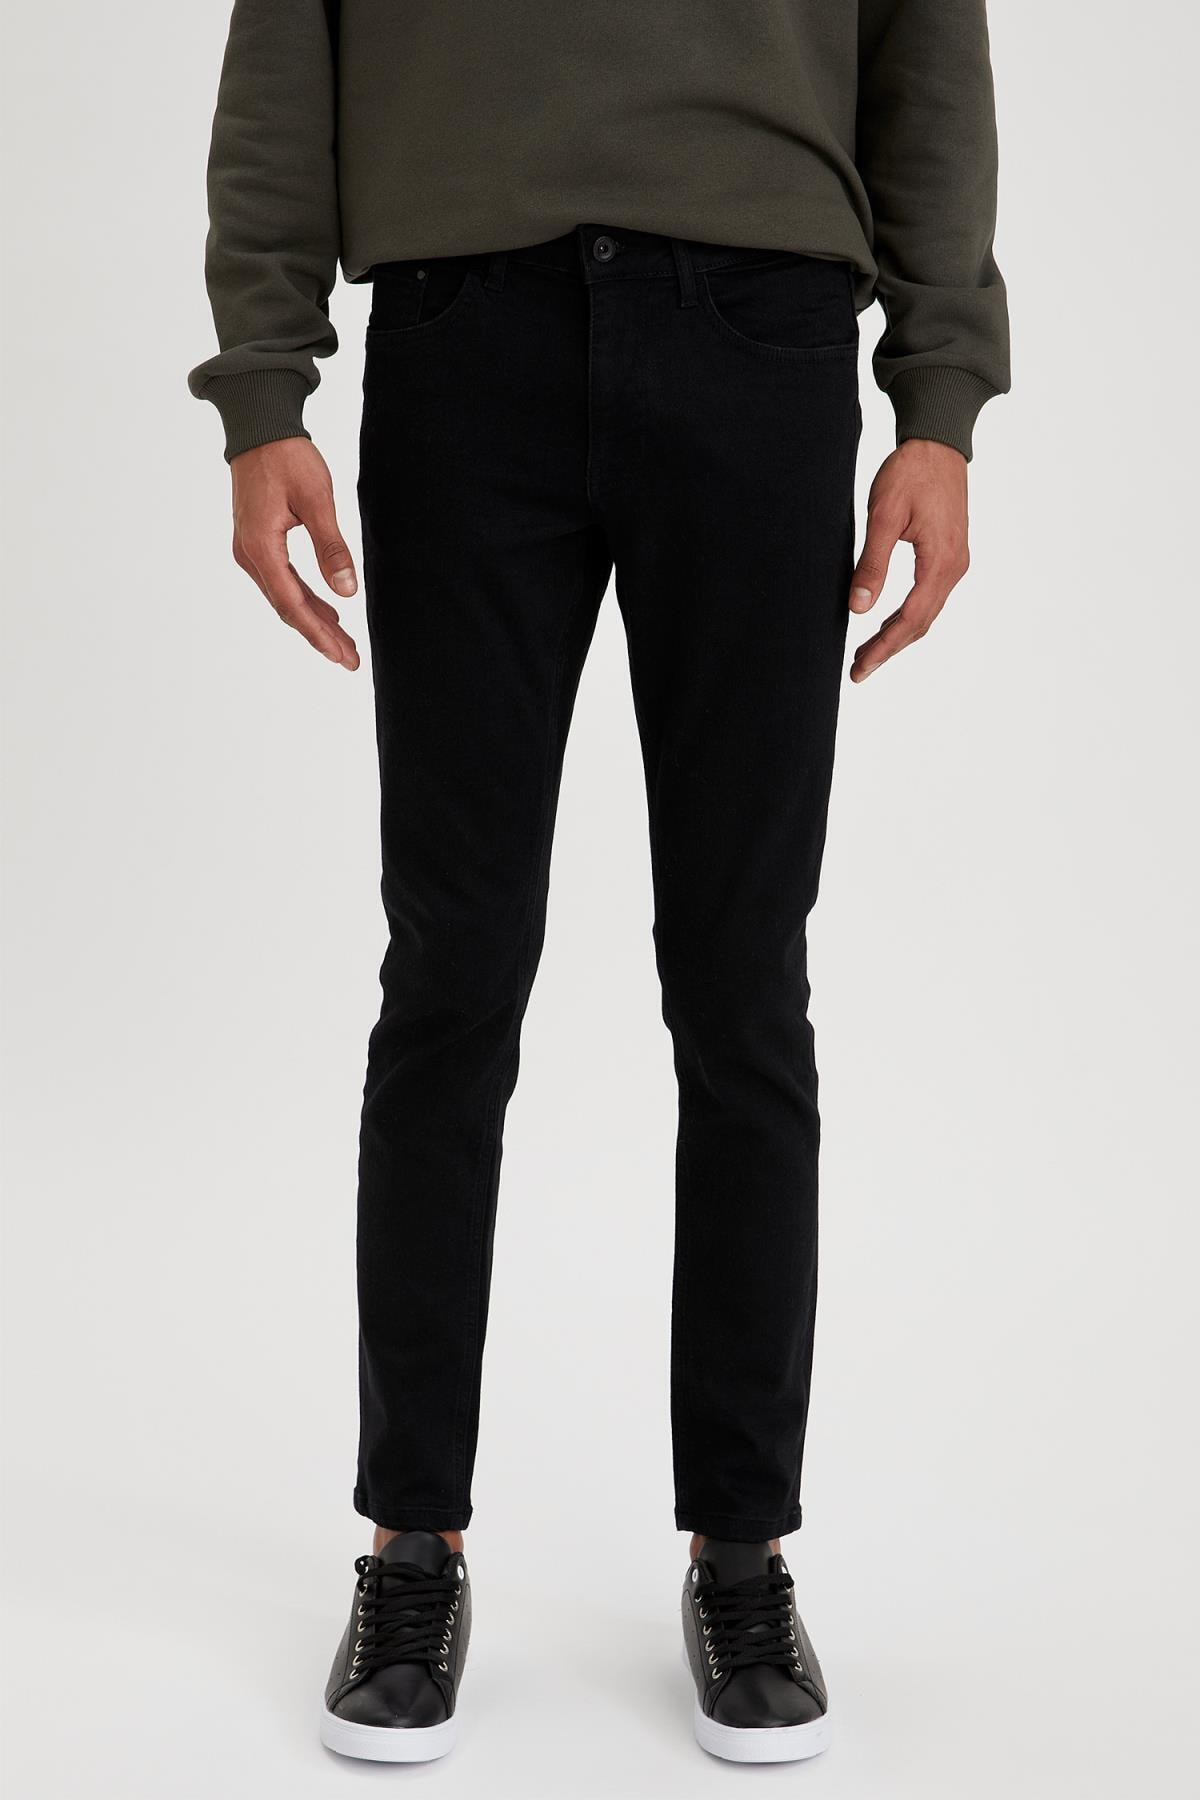 Martin Super Skinny Düşük Bel Dar Paça Jean Pantolon